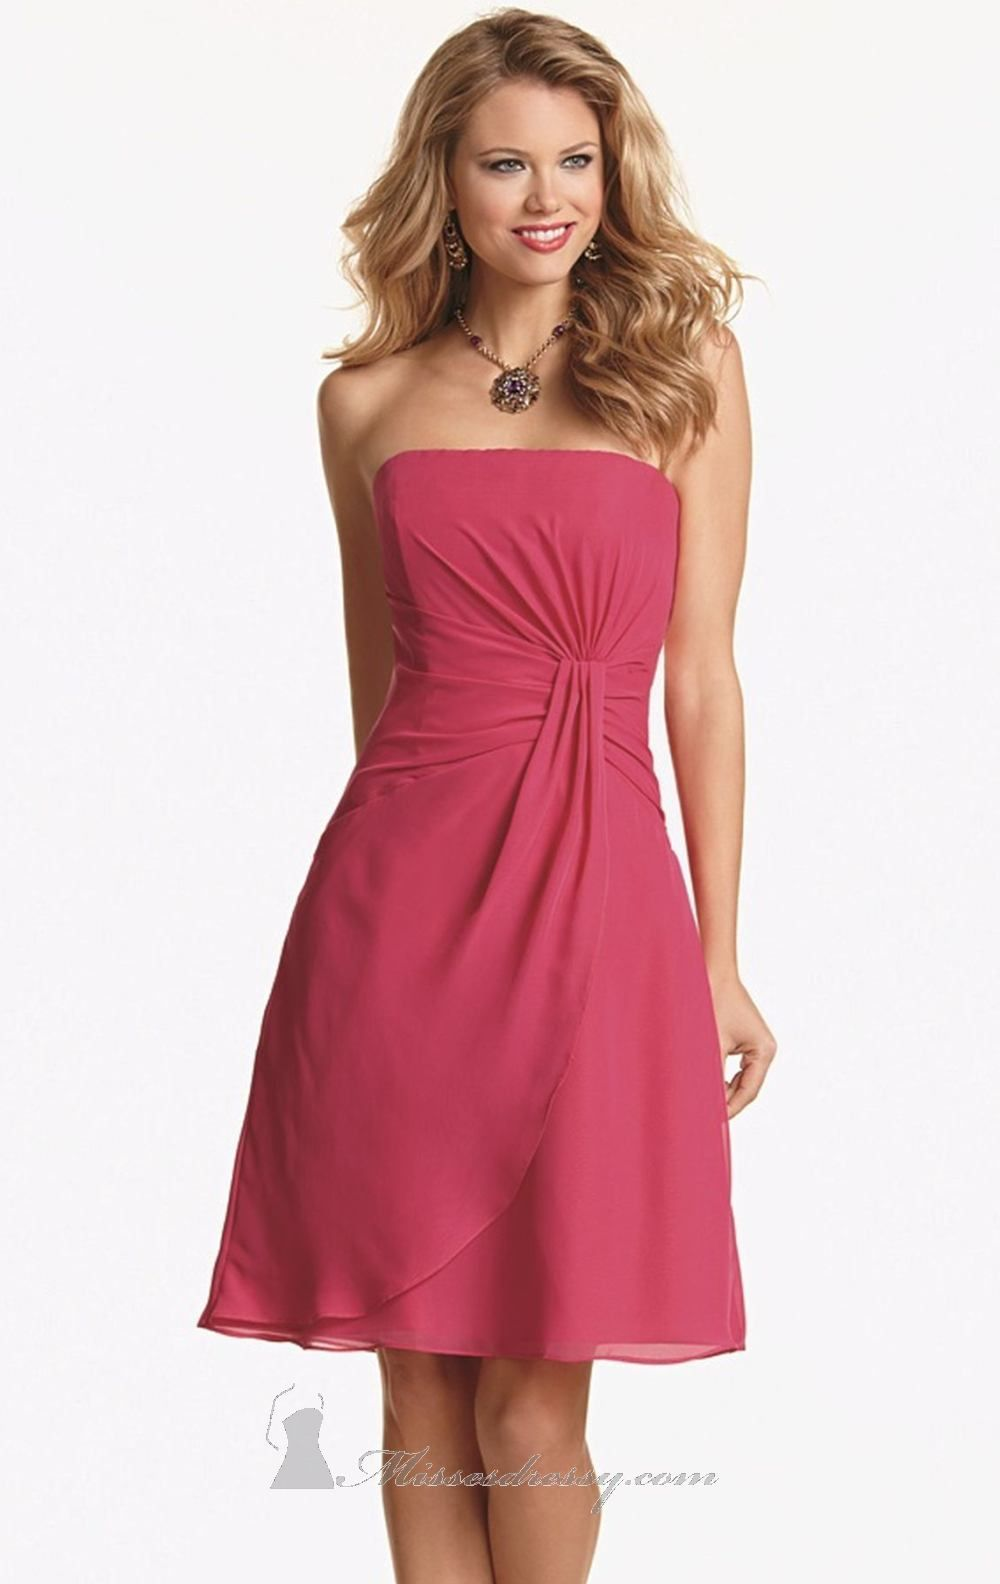 Jordan 383 Dress Missesdressy Com Strapless Dress Formal Dresses Short Dresses [ 1584 x 1000 Pixel ]